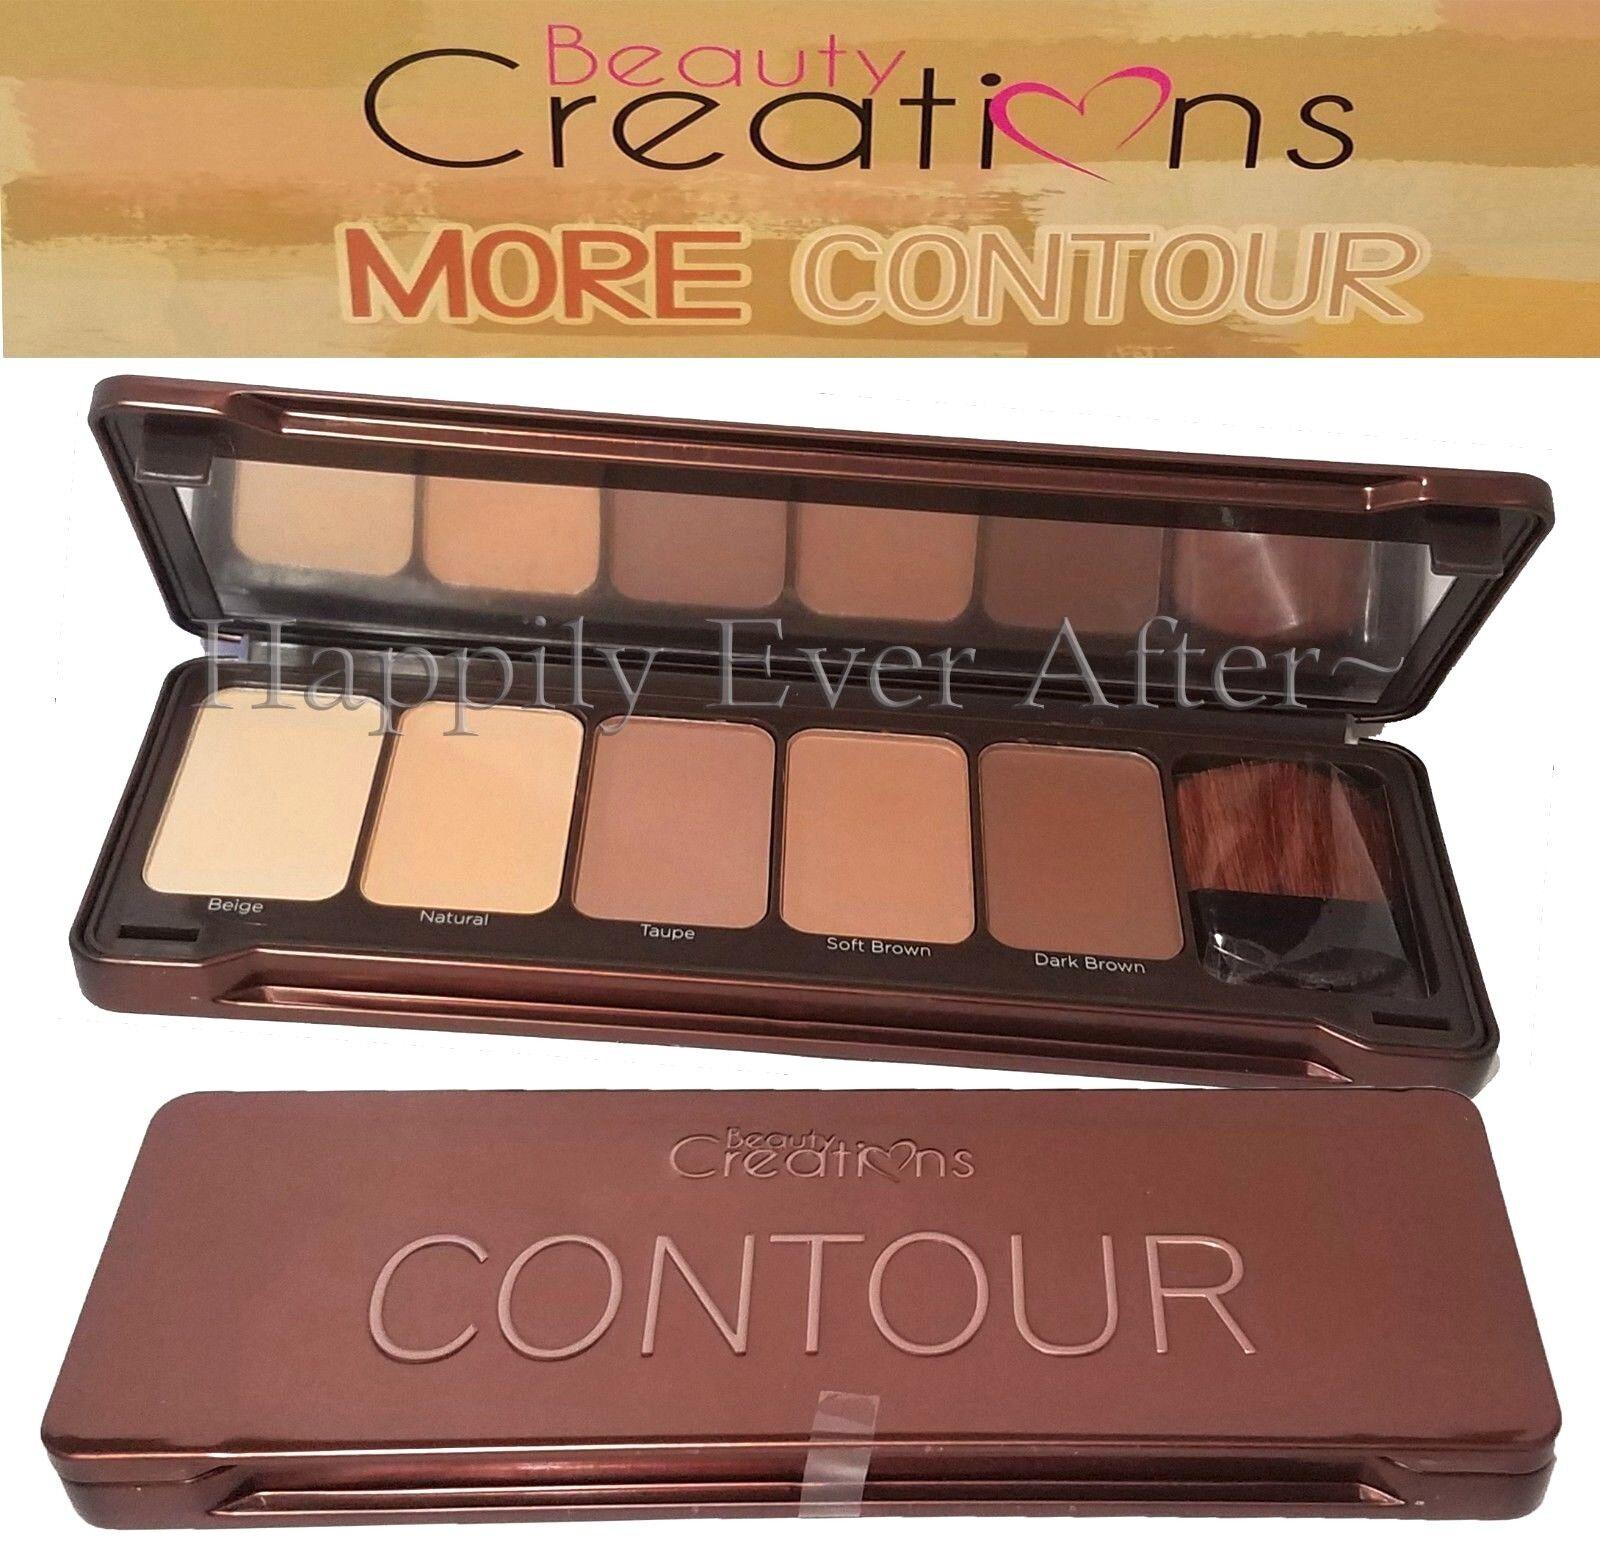 Contour Palette w/ Brush- Beauty Creations 5 Natural Shades to Contour Face